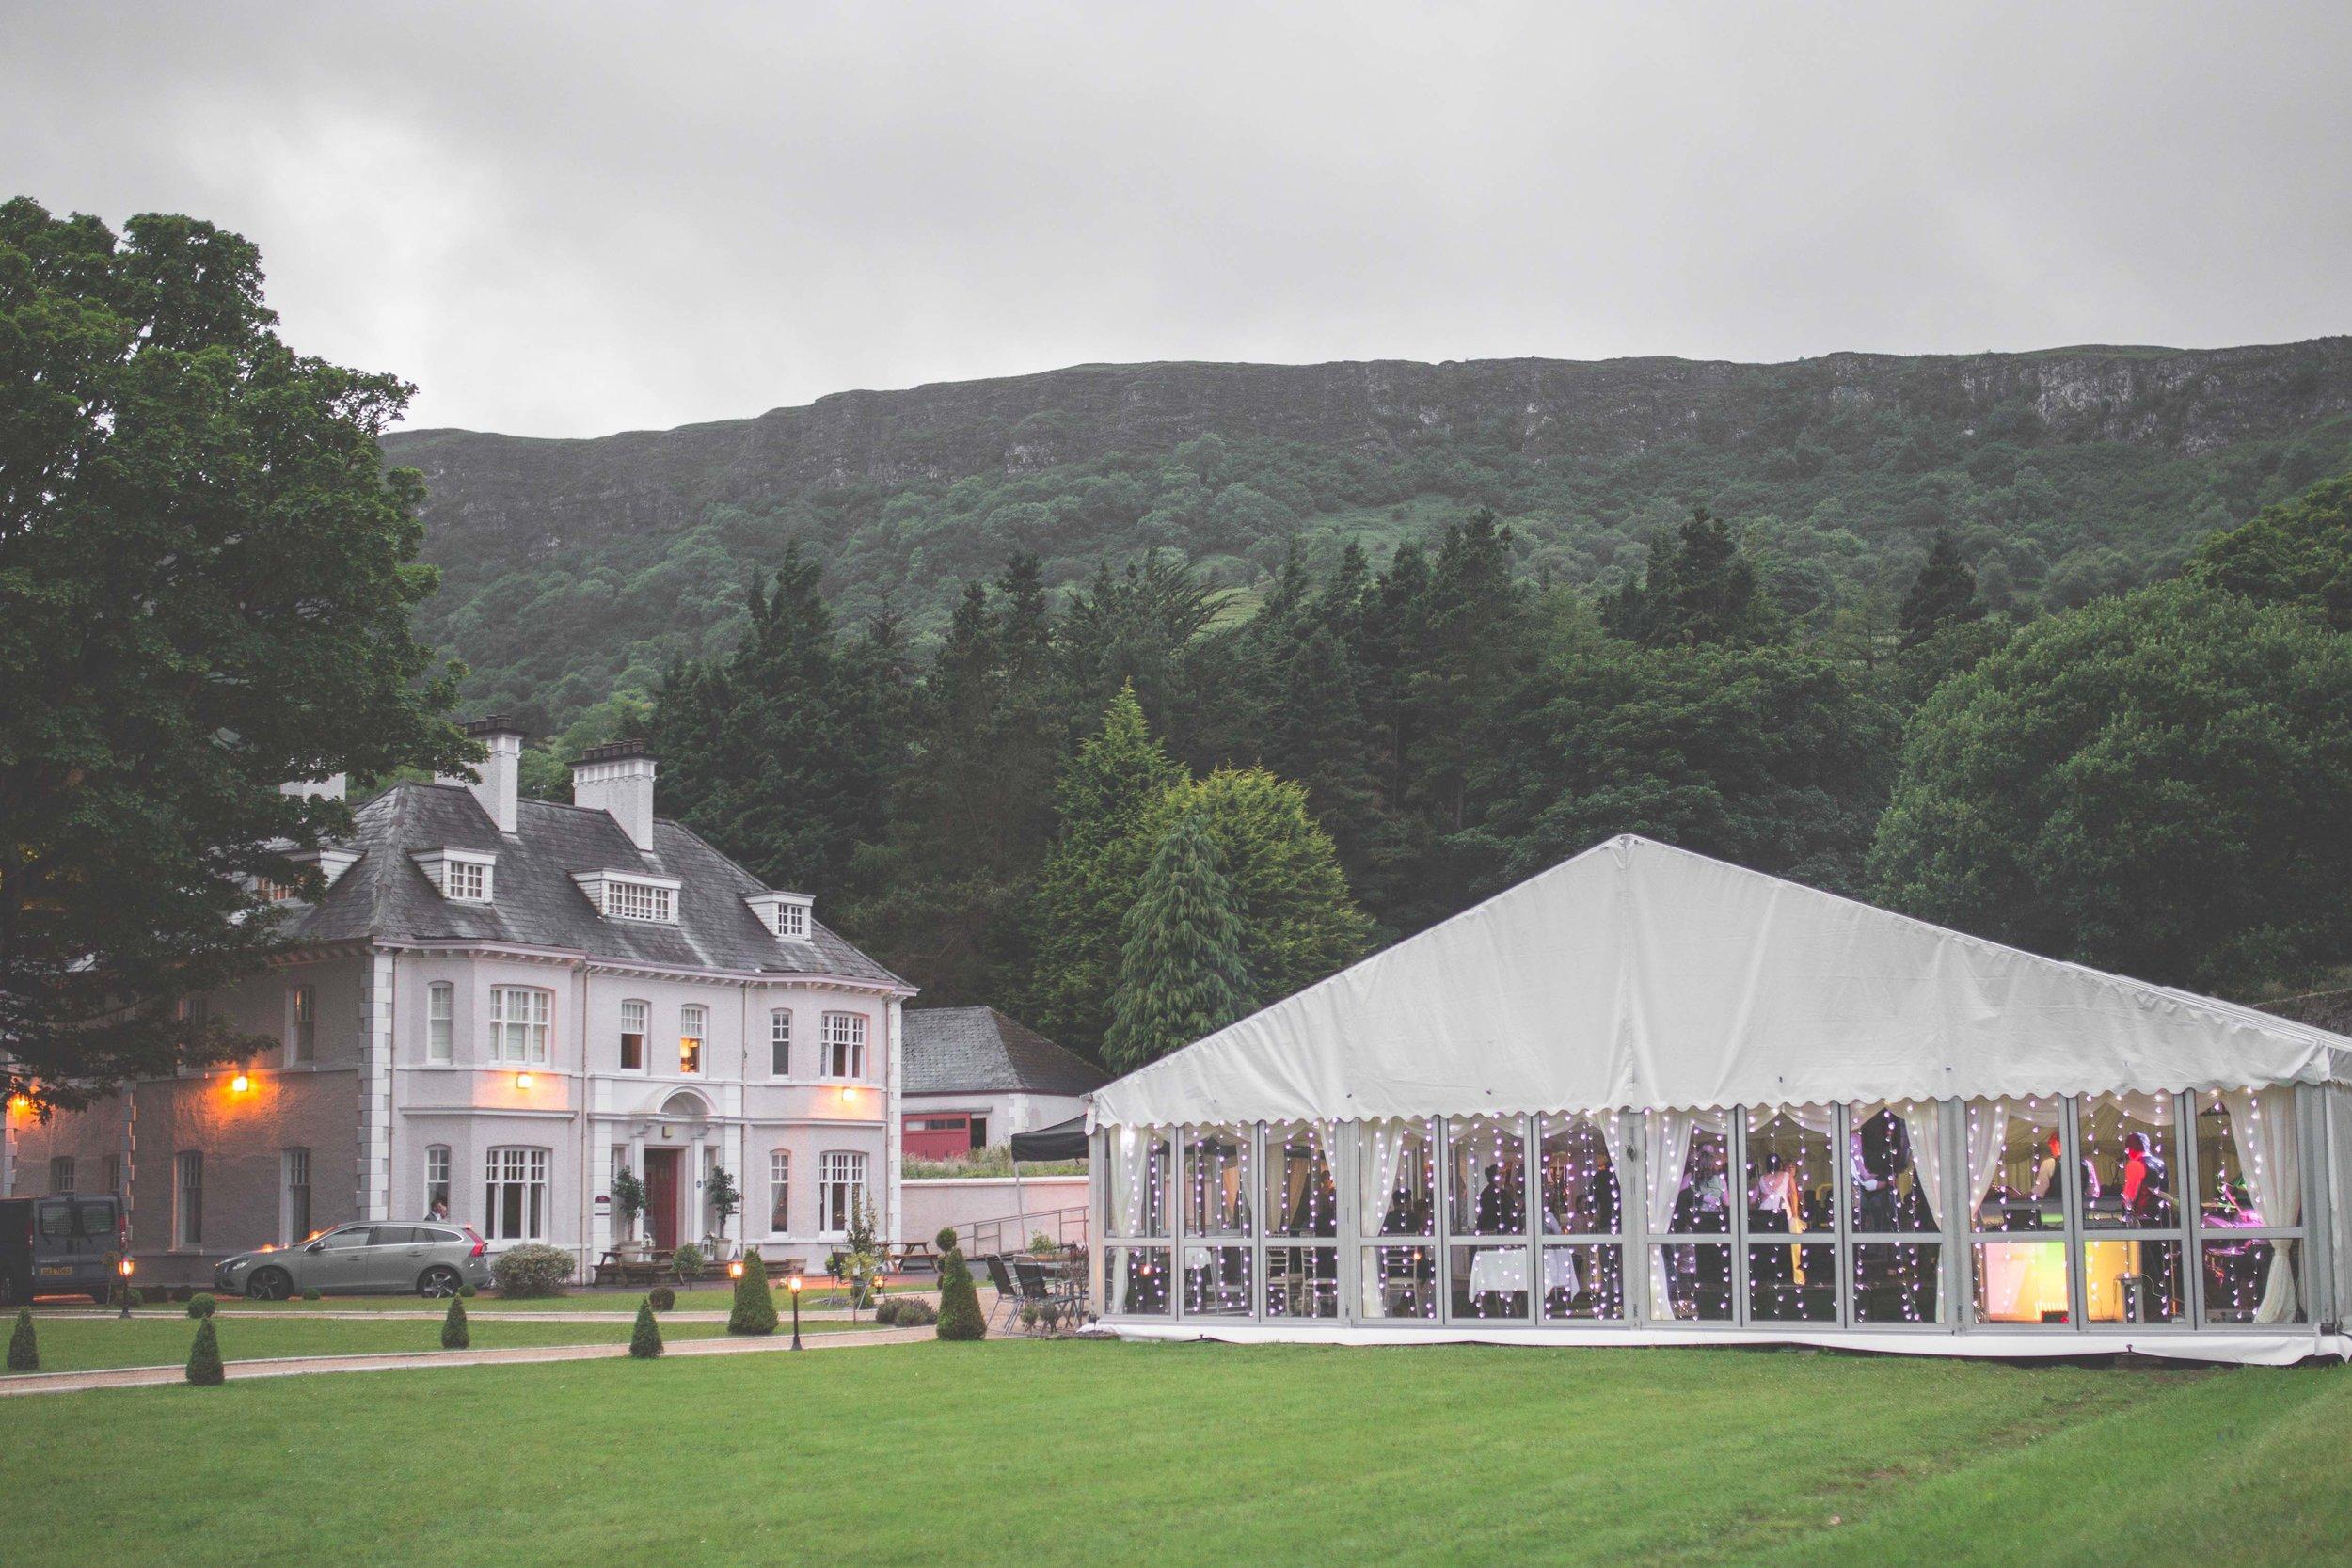 Northern Ireland Wedding Photographer   Brian McEwan Photography   Affordable Wedding Photography Throughout Antrim Down Armagh Tyrone Londonderry Derry Down Fermanagh -80.jpg